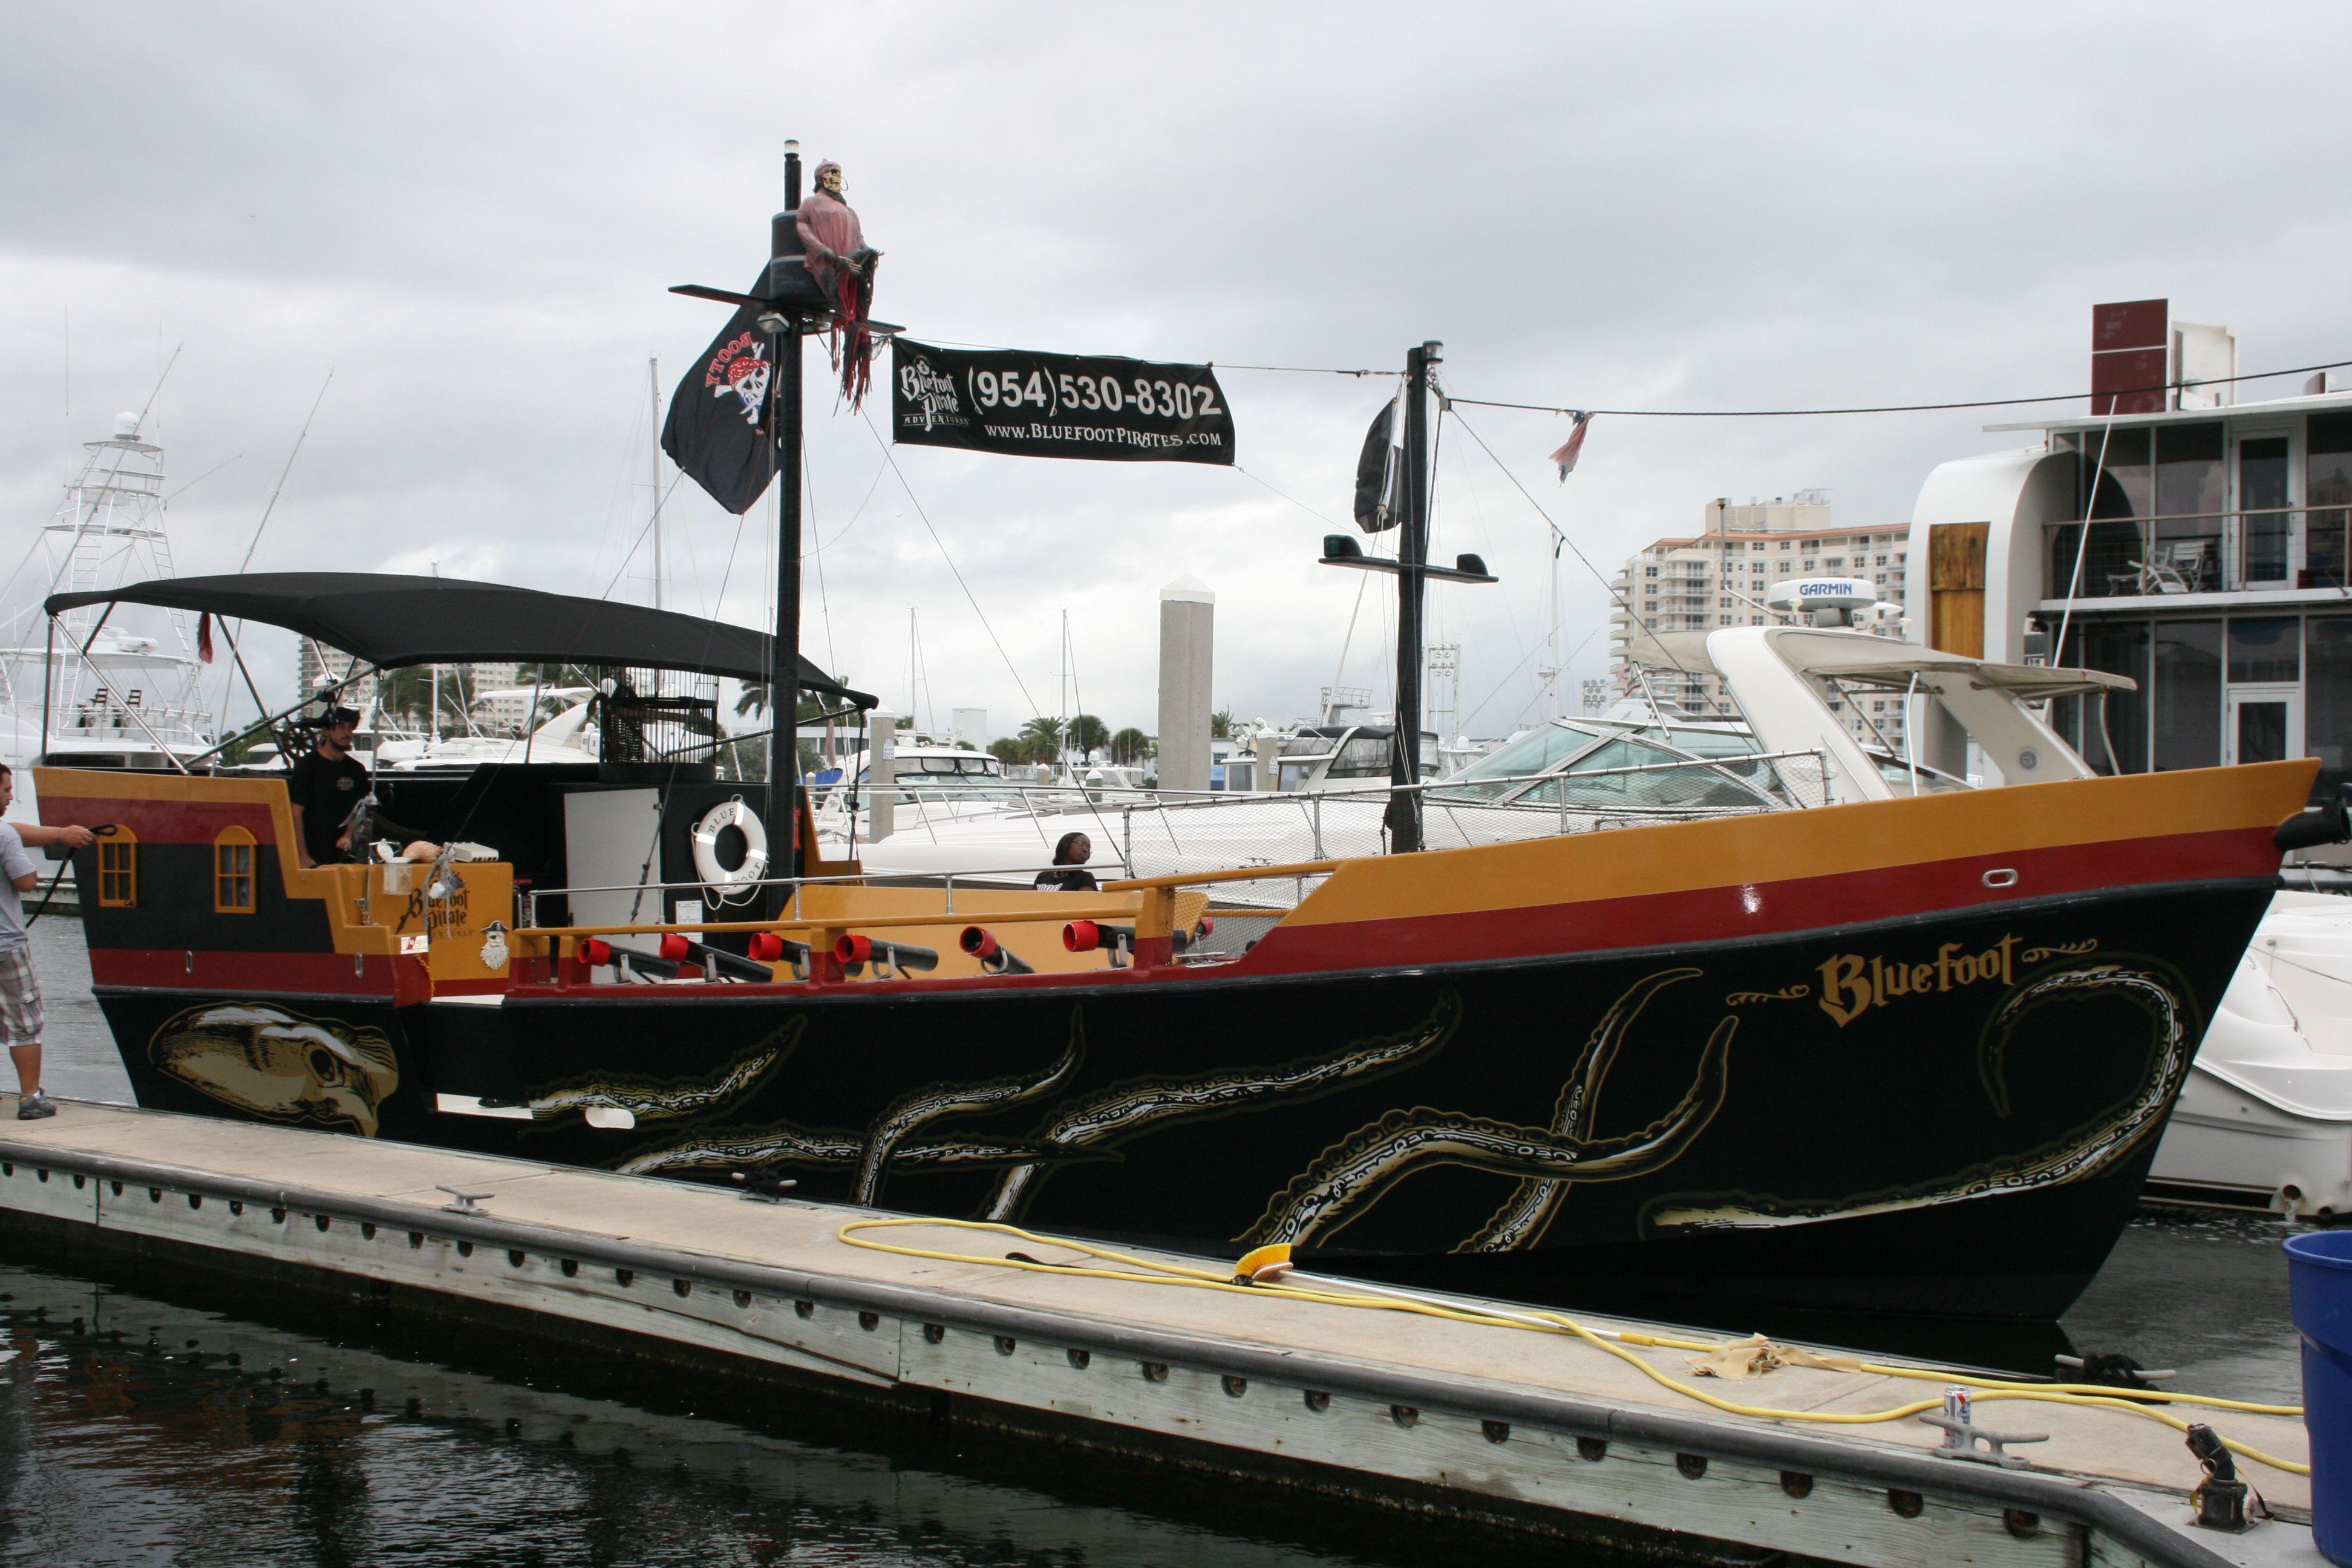 Fort Lauderdale Custom Vinyl Boat Decals Kraken Octupus Graphics - Boat decals custom graphics